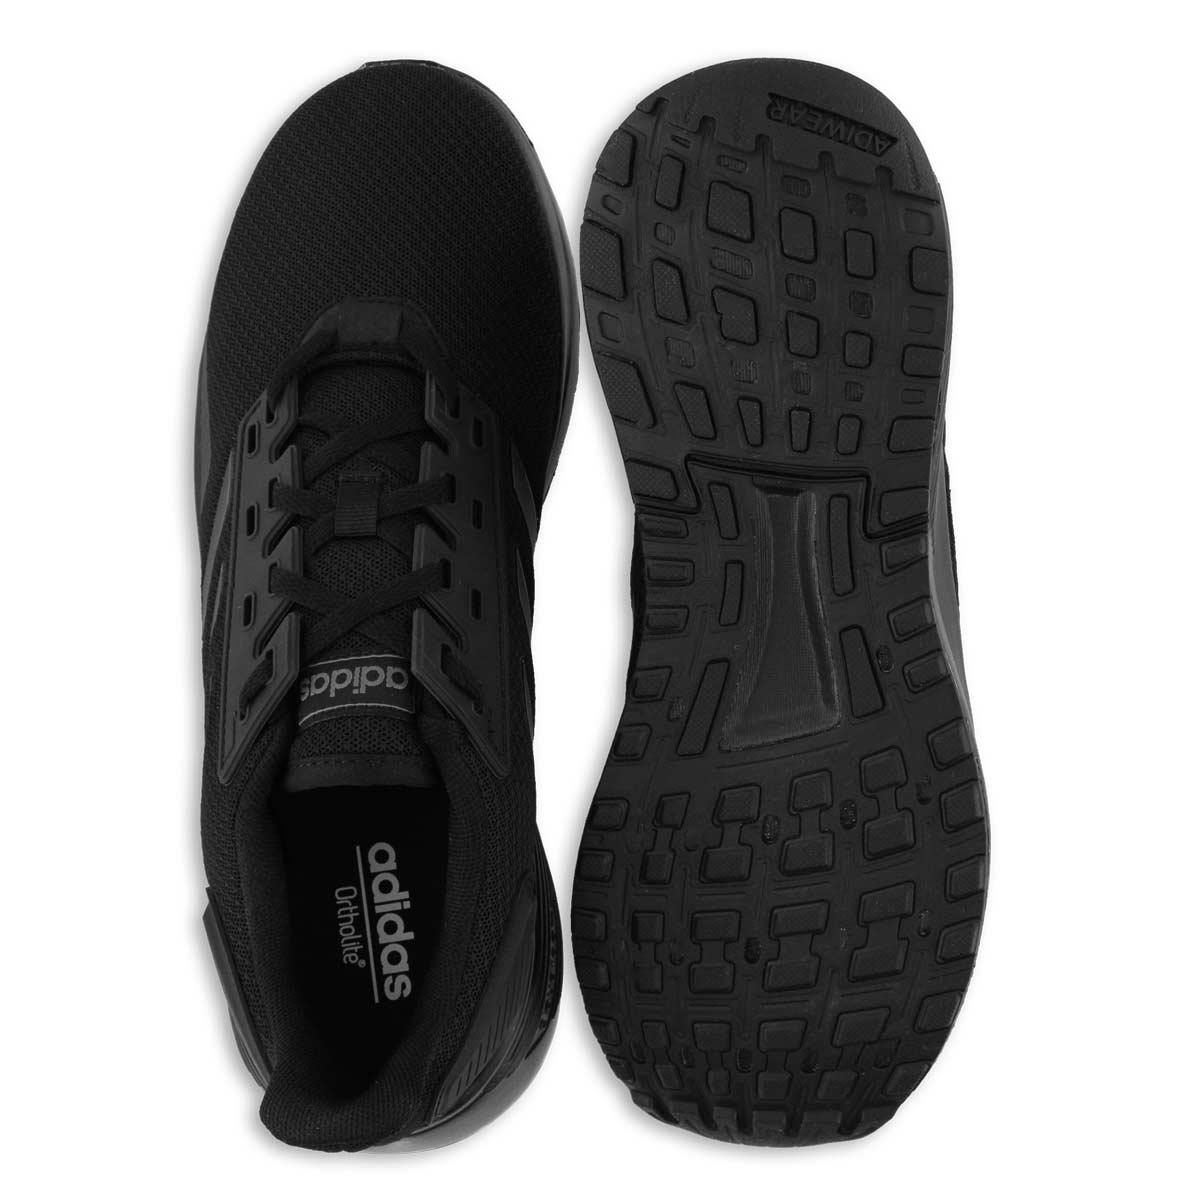 Mns Duramo 9 blk/blk running shoe